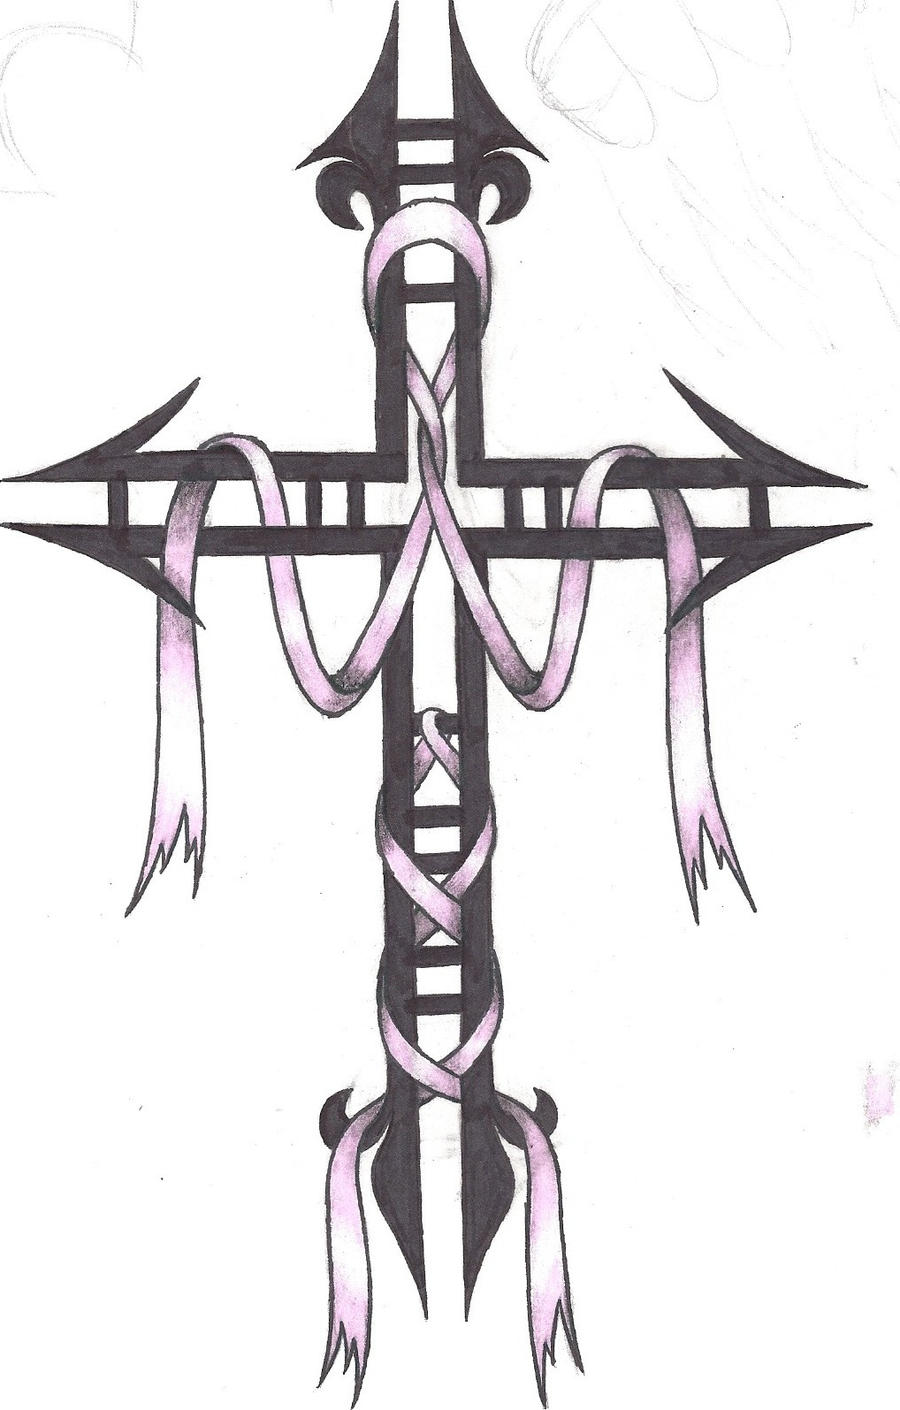 cancer ribbon cross by heavymetalhitter on deviantart. Black Bedroom Furniture Sets. Home Design Ideas